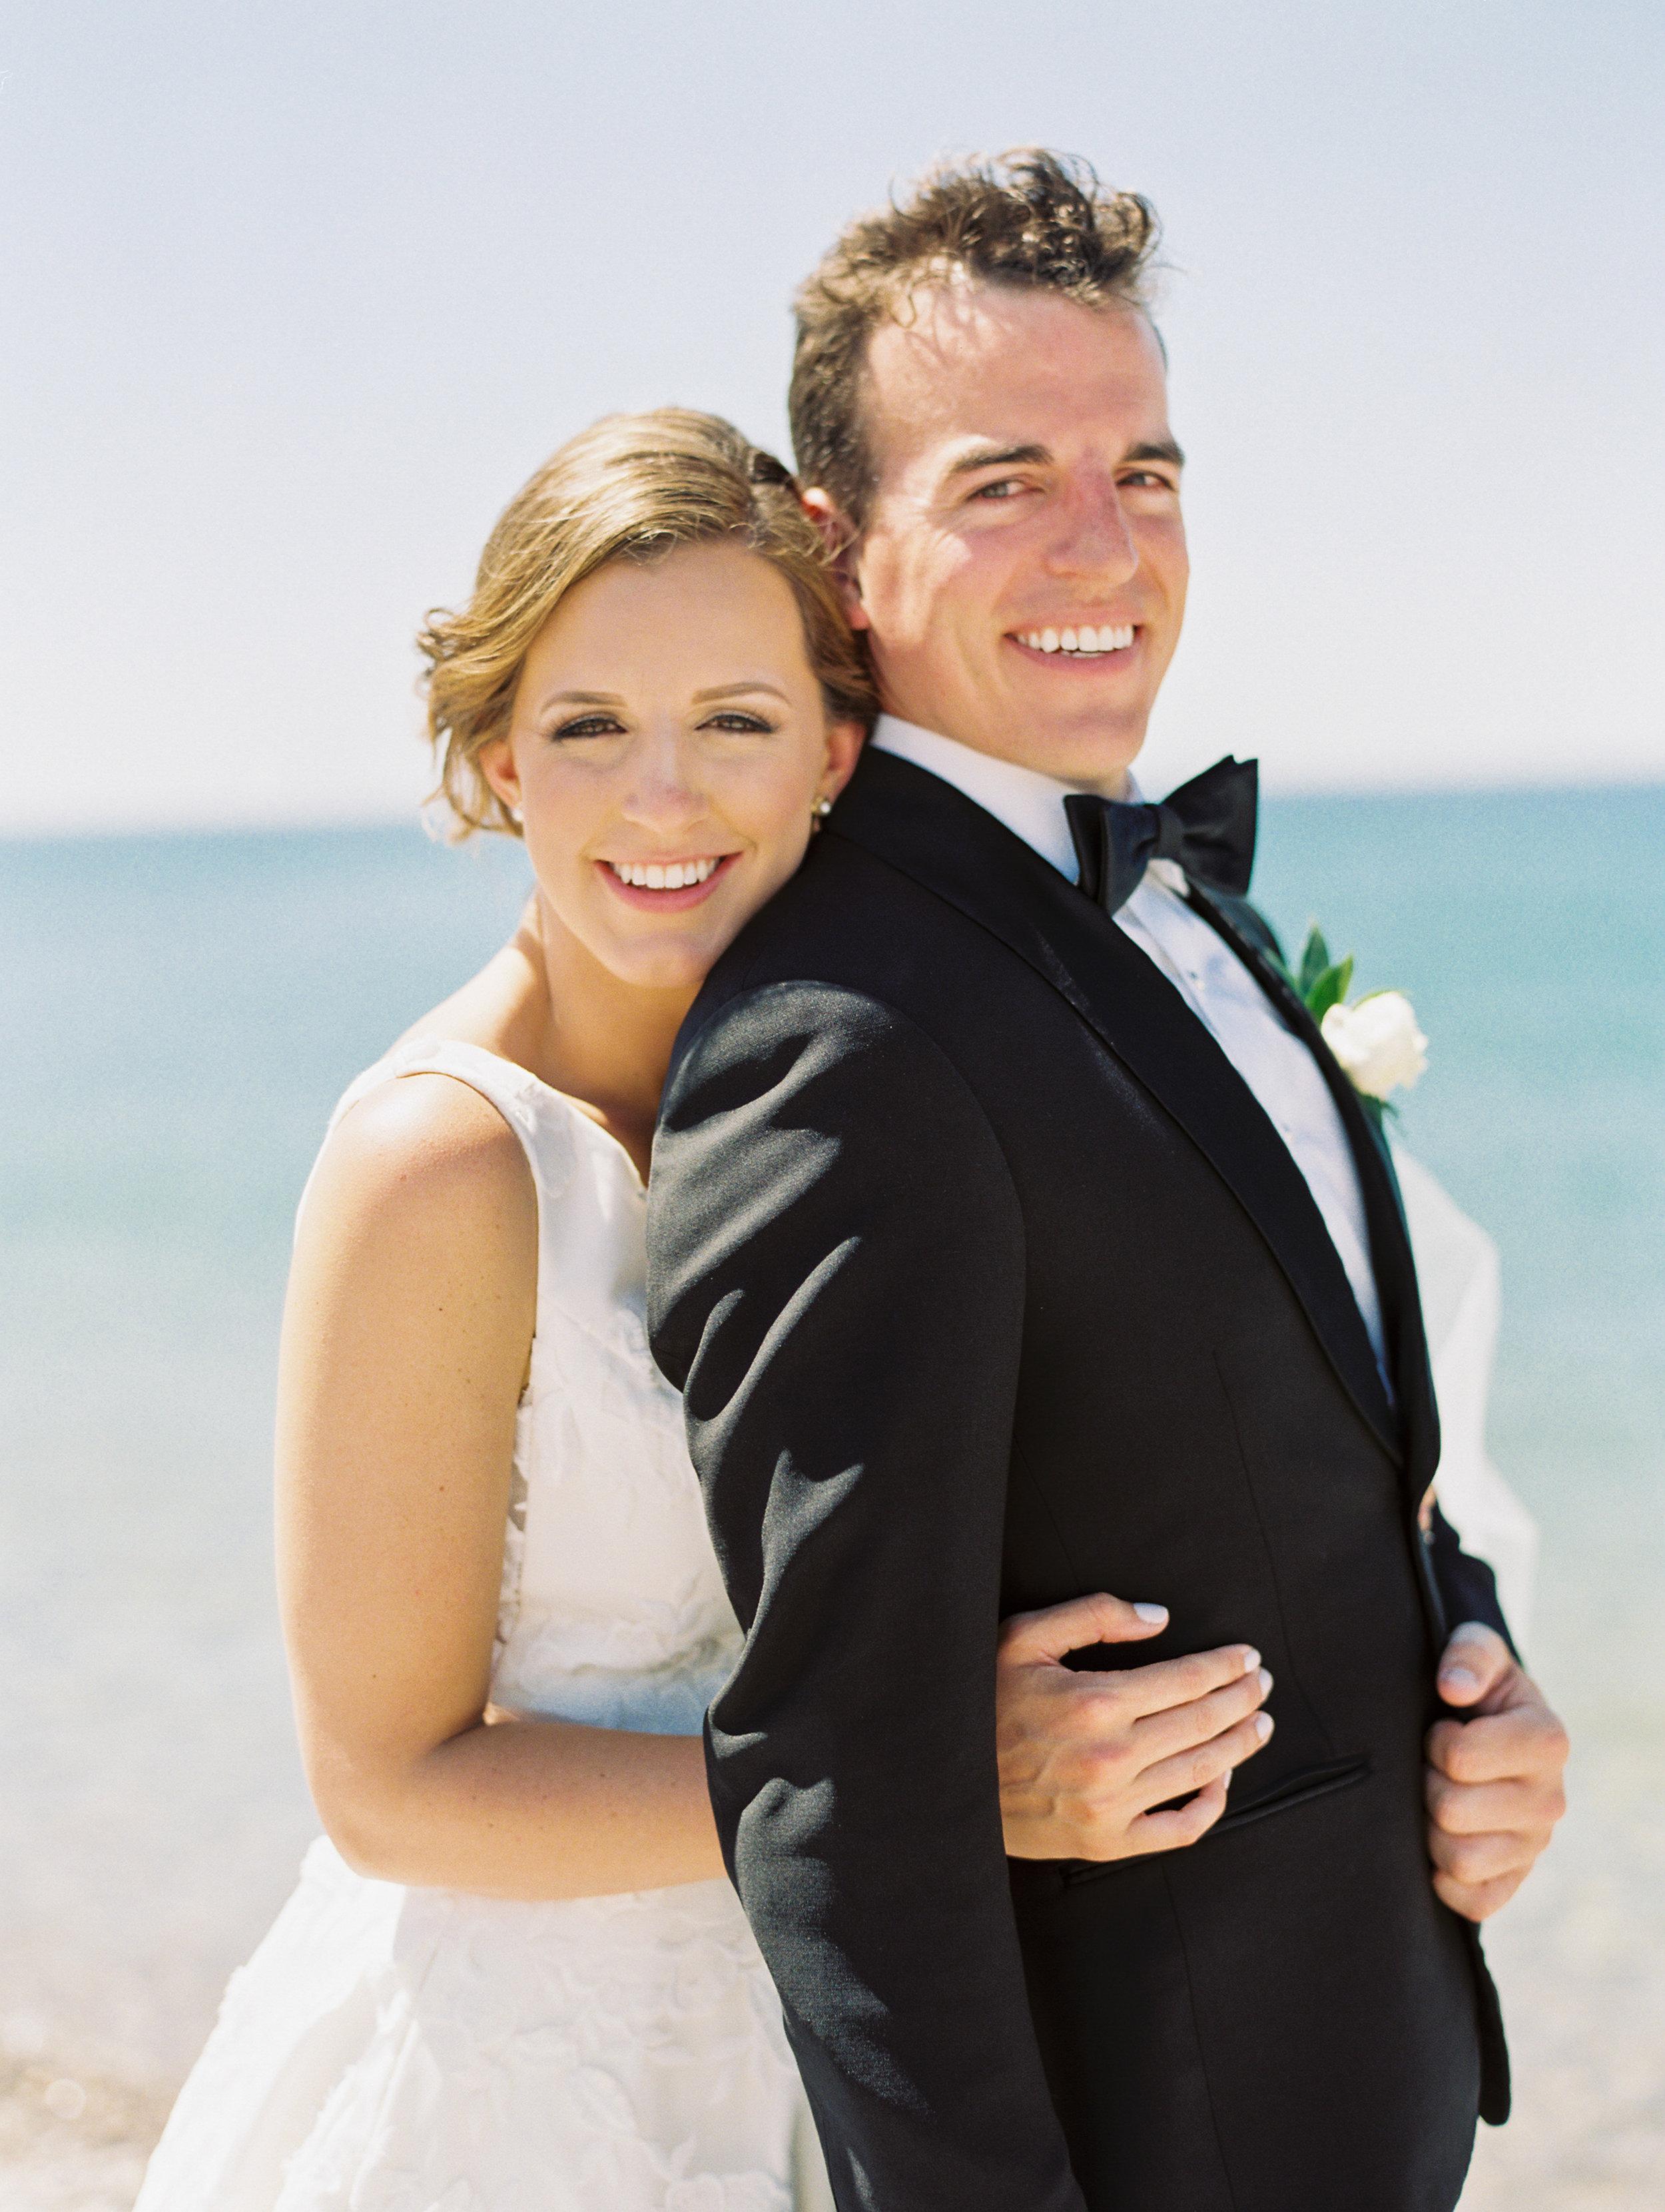 DeGuilio+Wedding+Bridal+Partyf-116.jpg